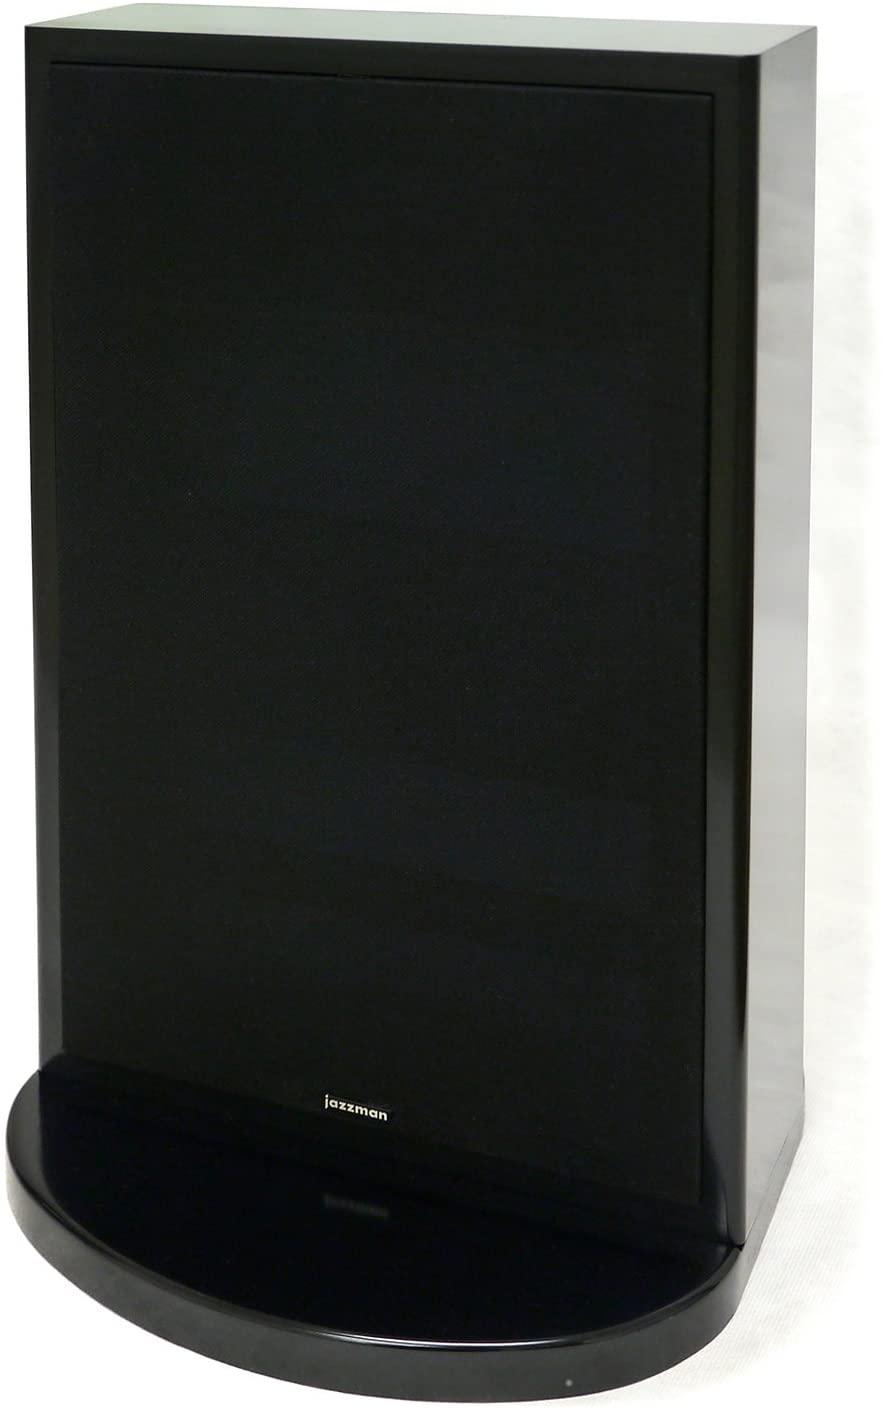 jazzman J-01X High End Speaker for Listening to Jazz an omnidirectional Audio Revolution (L+R Stereo Set)